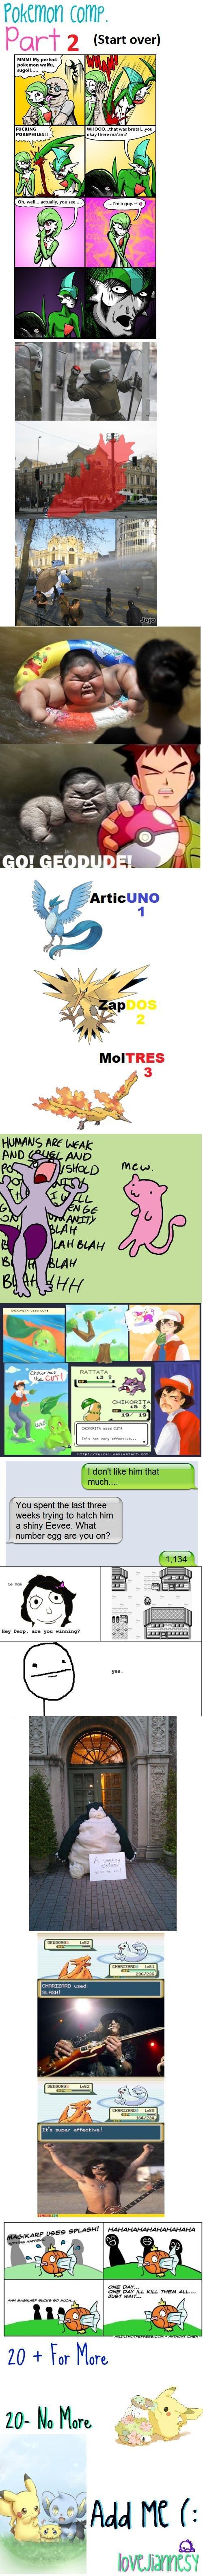 Pokemon Comp Part 2. Part 1: funnyjunk.com/funny_pictures/2630649/Pokemon+Comp+Part+1/ Part 3: funnyjunk.com/funny_pictures/2637869/Pokemon+Comp+Part+3/ Part 4: